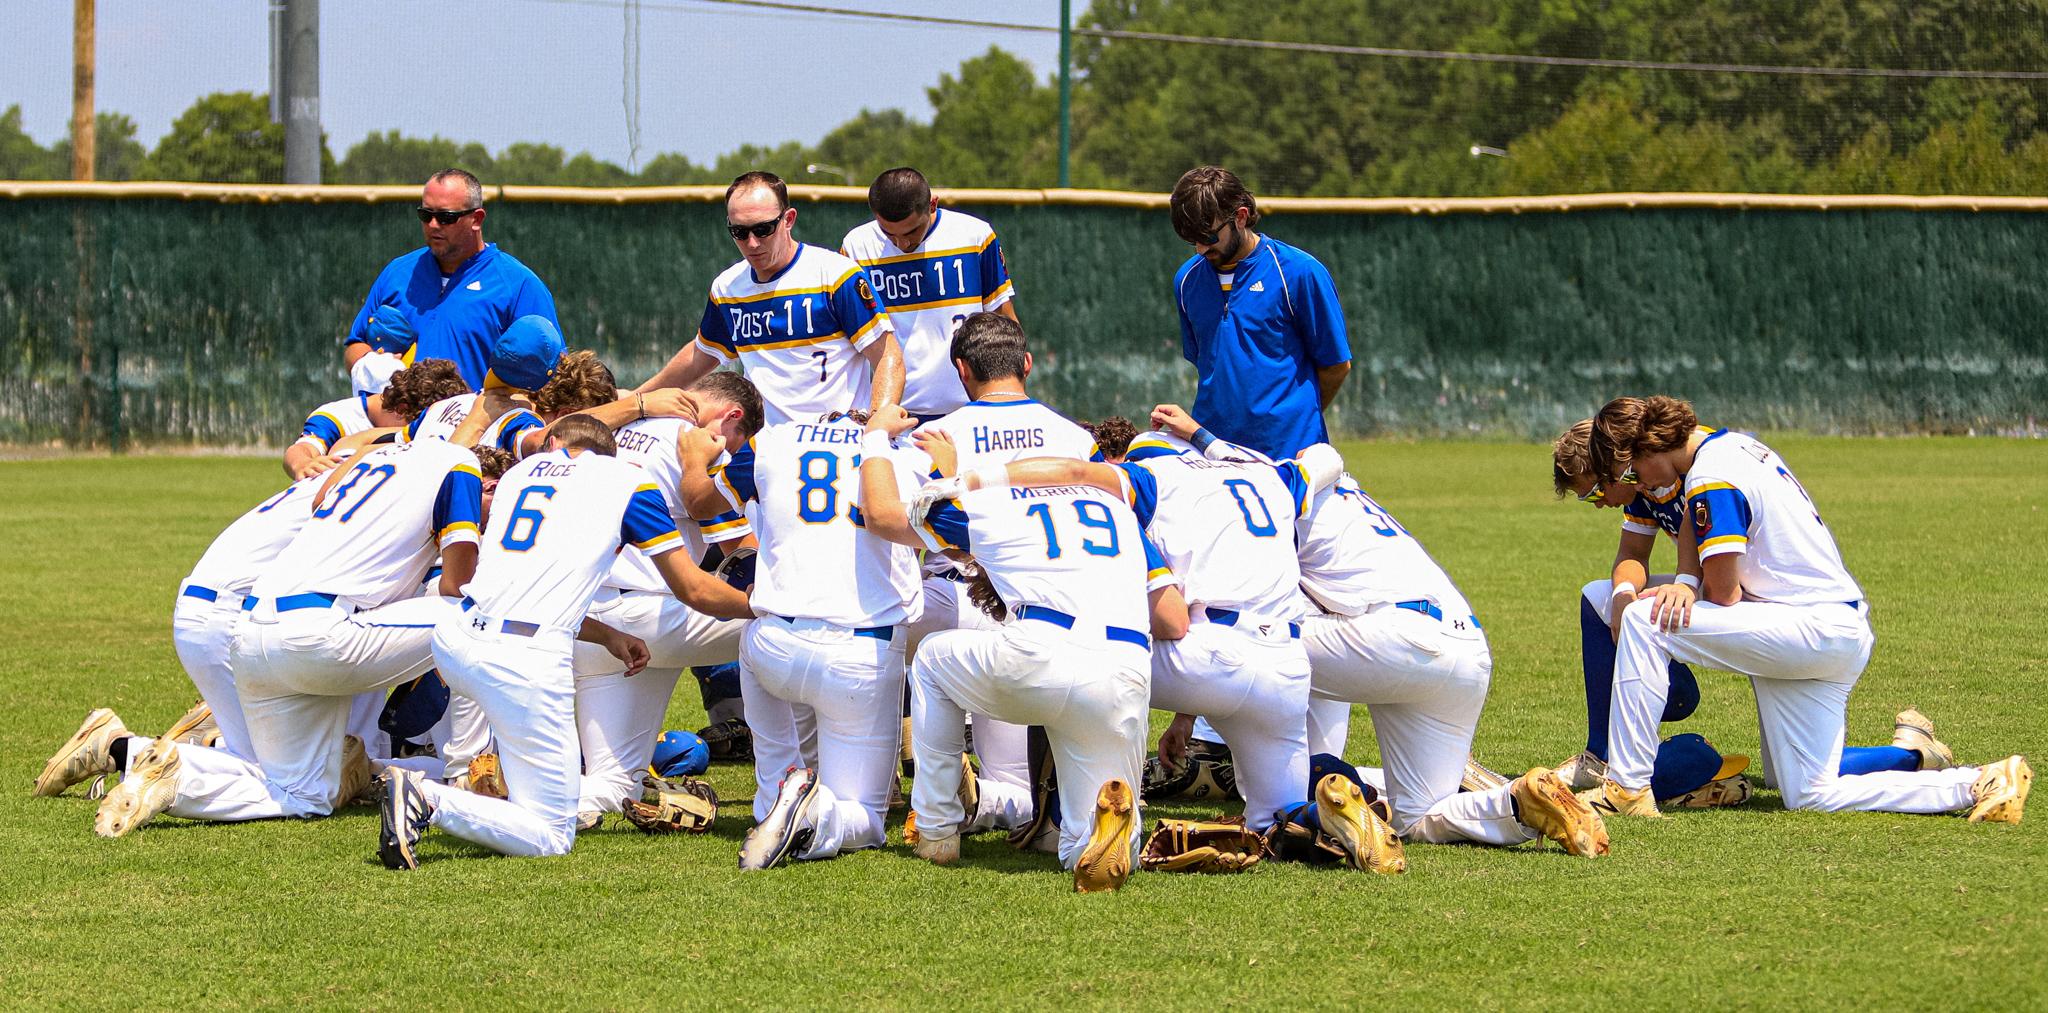 Baseball: Summer's Been Good To Wayne County Post 11 (PHOTO GALLERY)